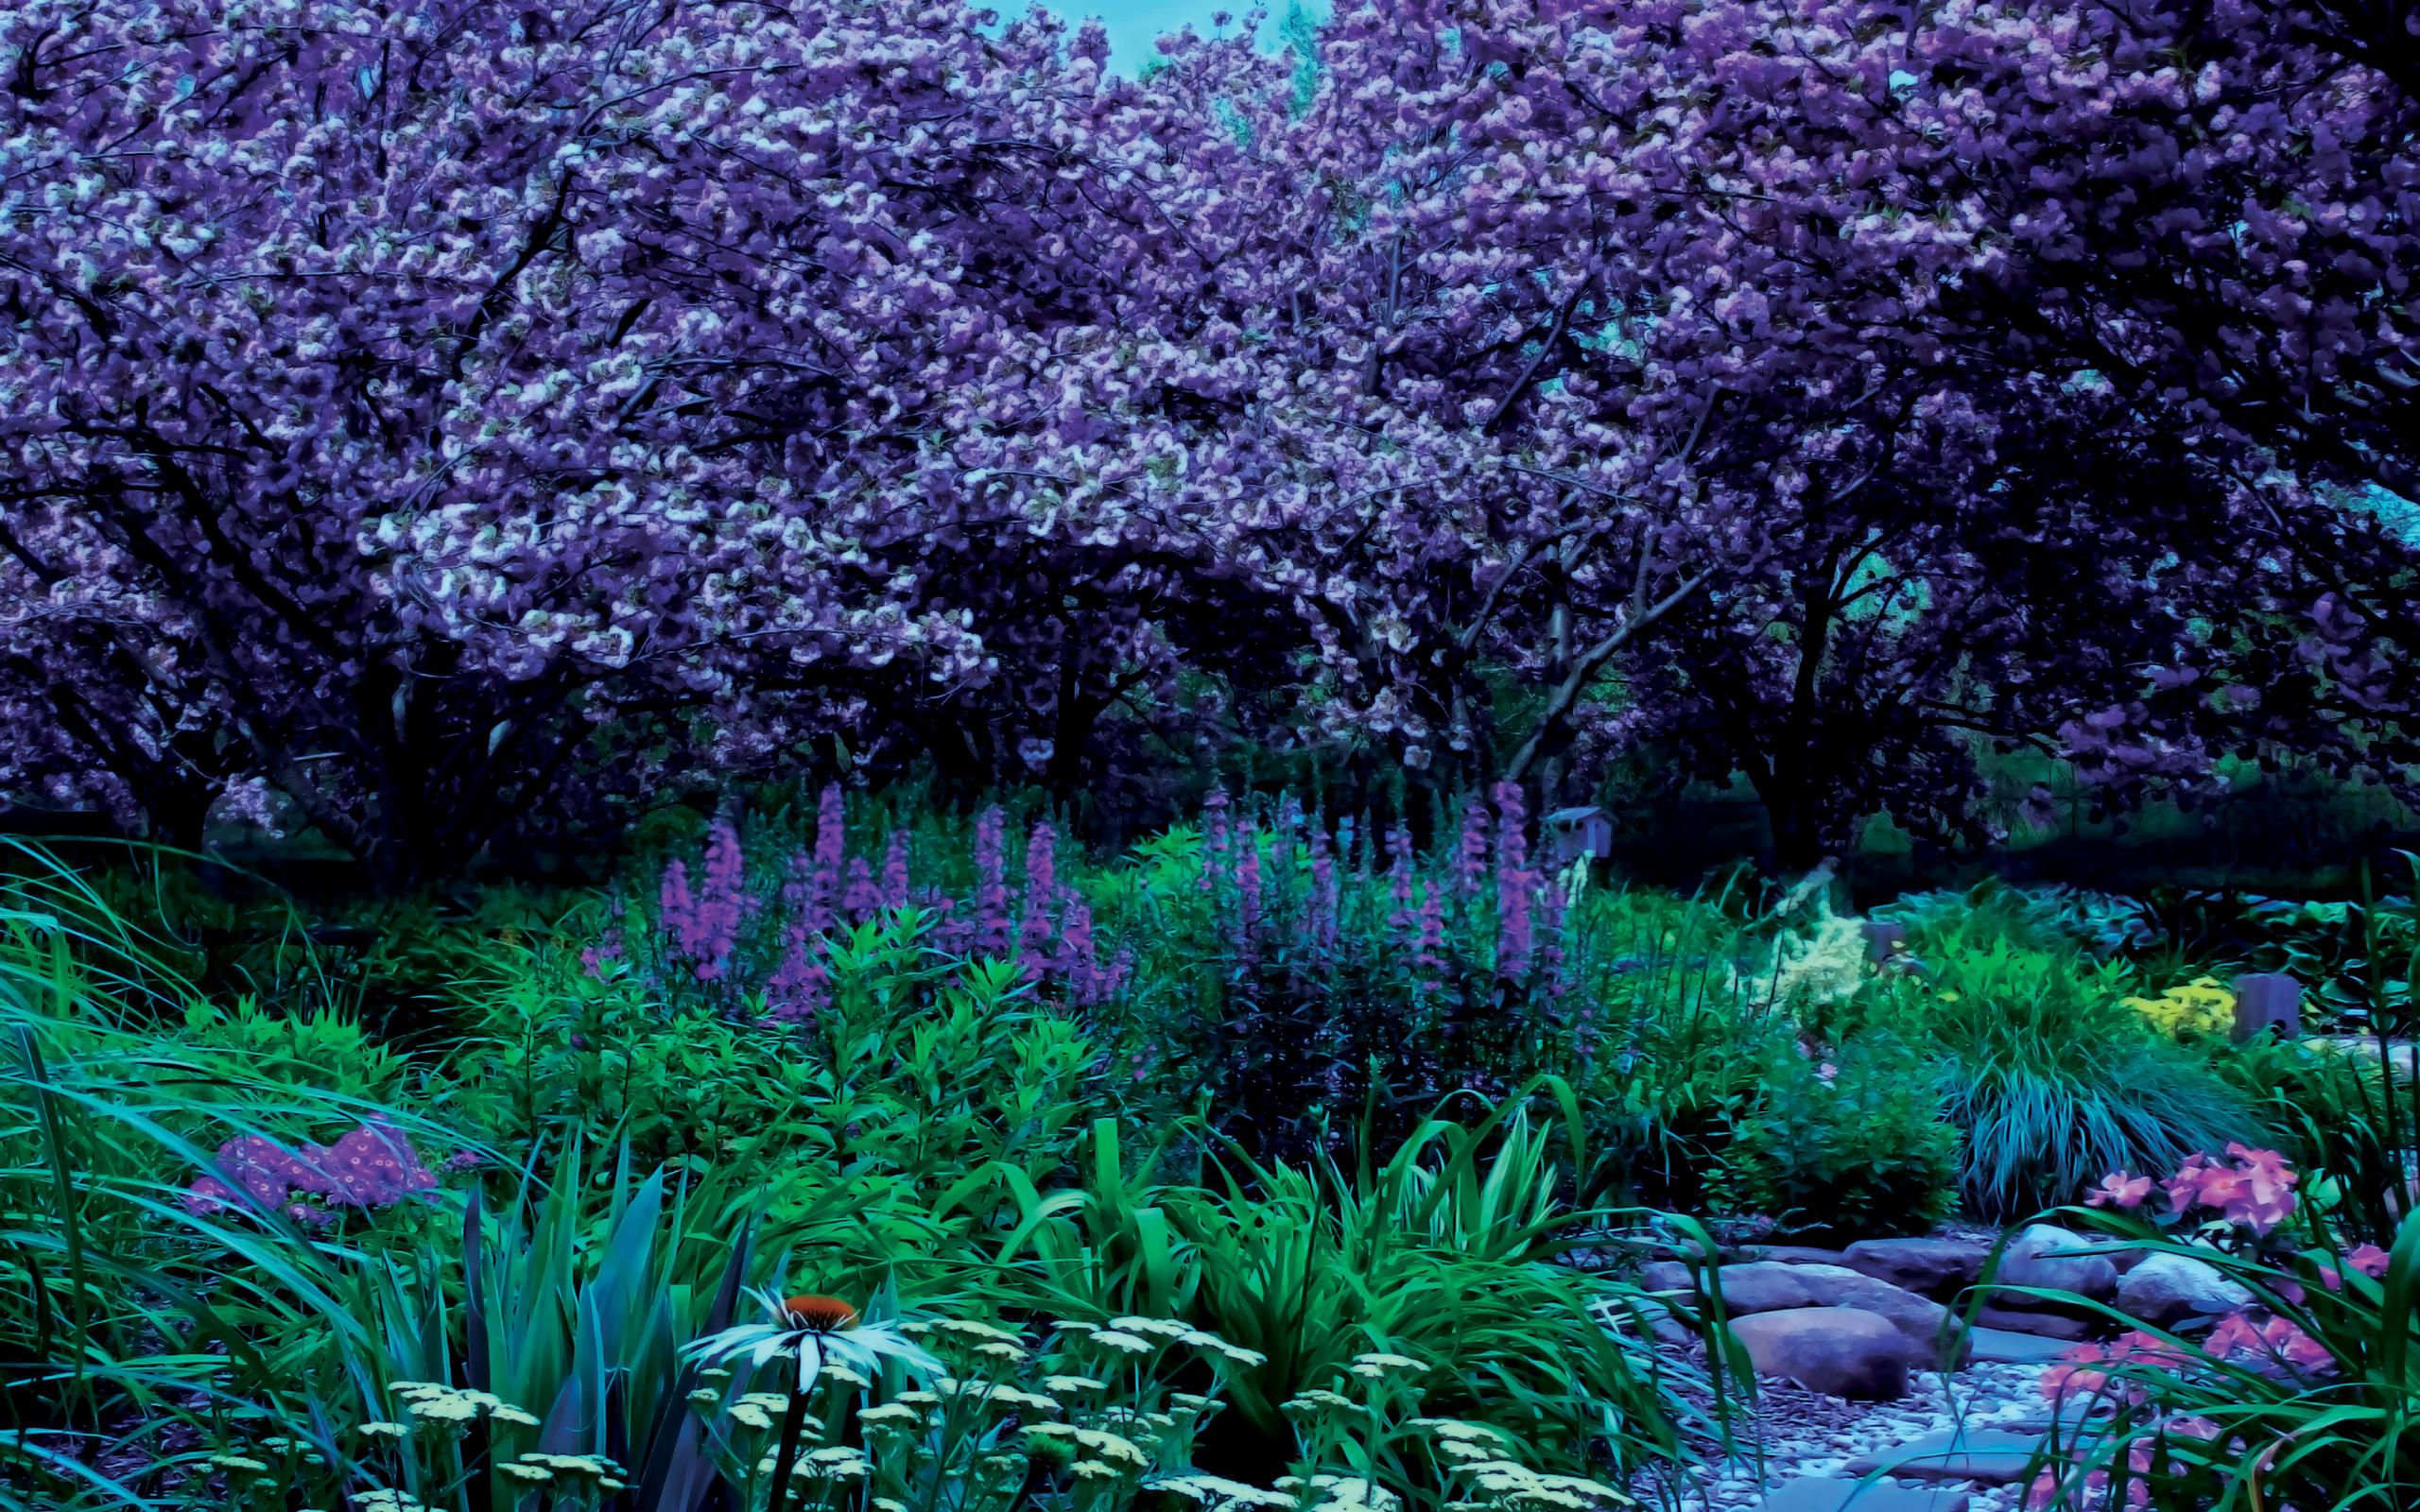 Jardin fonds d 39 cran arri res plan 2560x1600 id 396564 - Fond d ecran jardin anglais ...